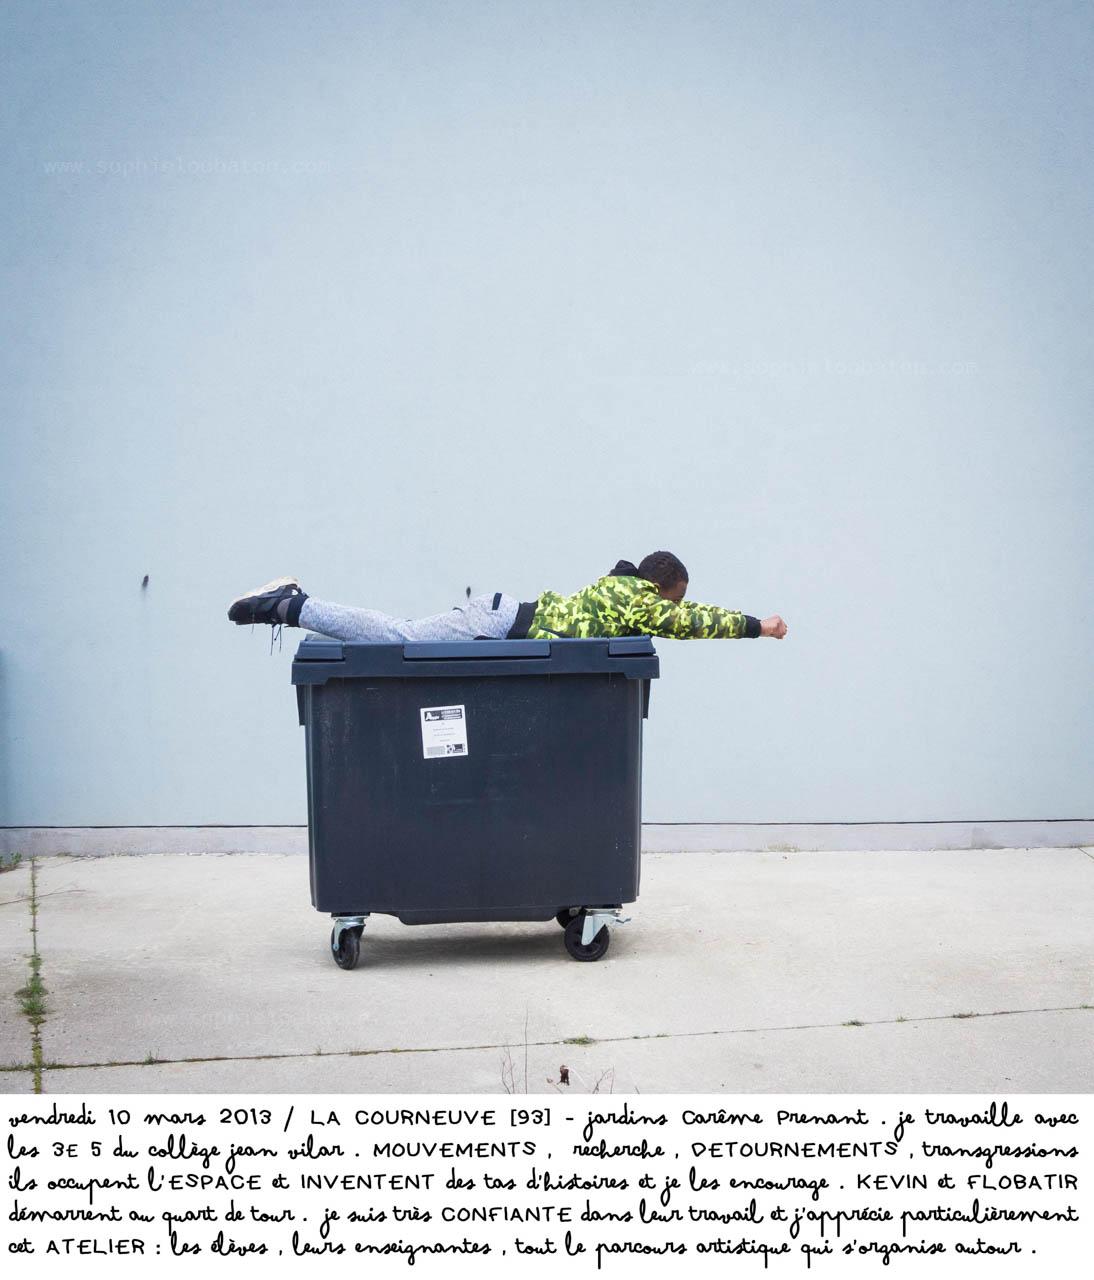 sophie loubaton, photographe. candidature prix HSBC 2018. Brouillard journalier / 10 mars 2017.